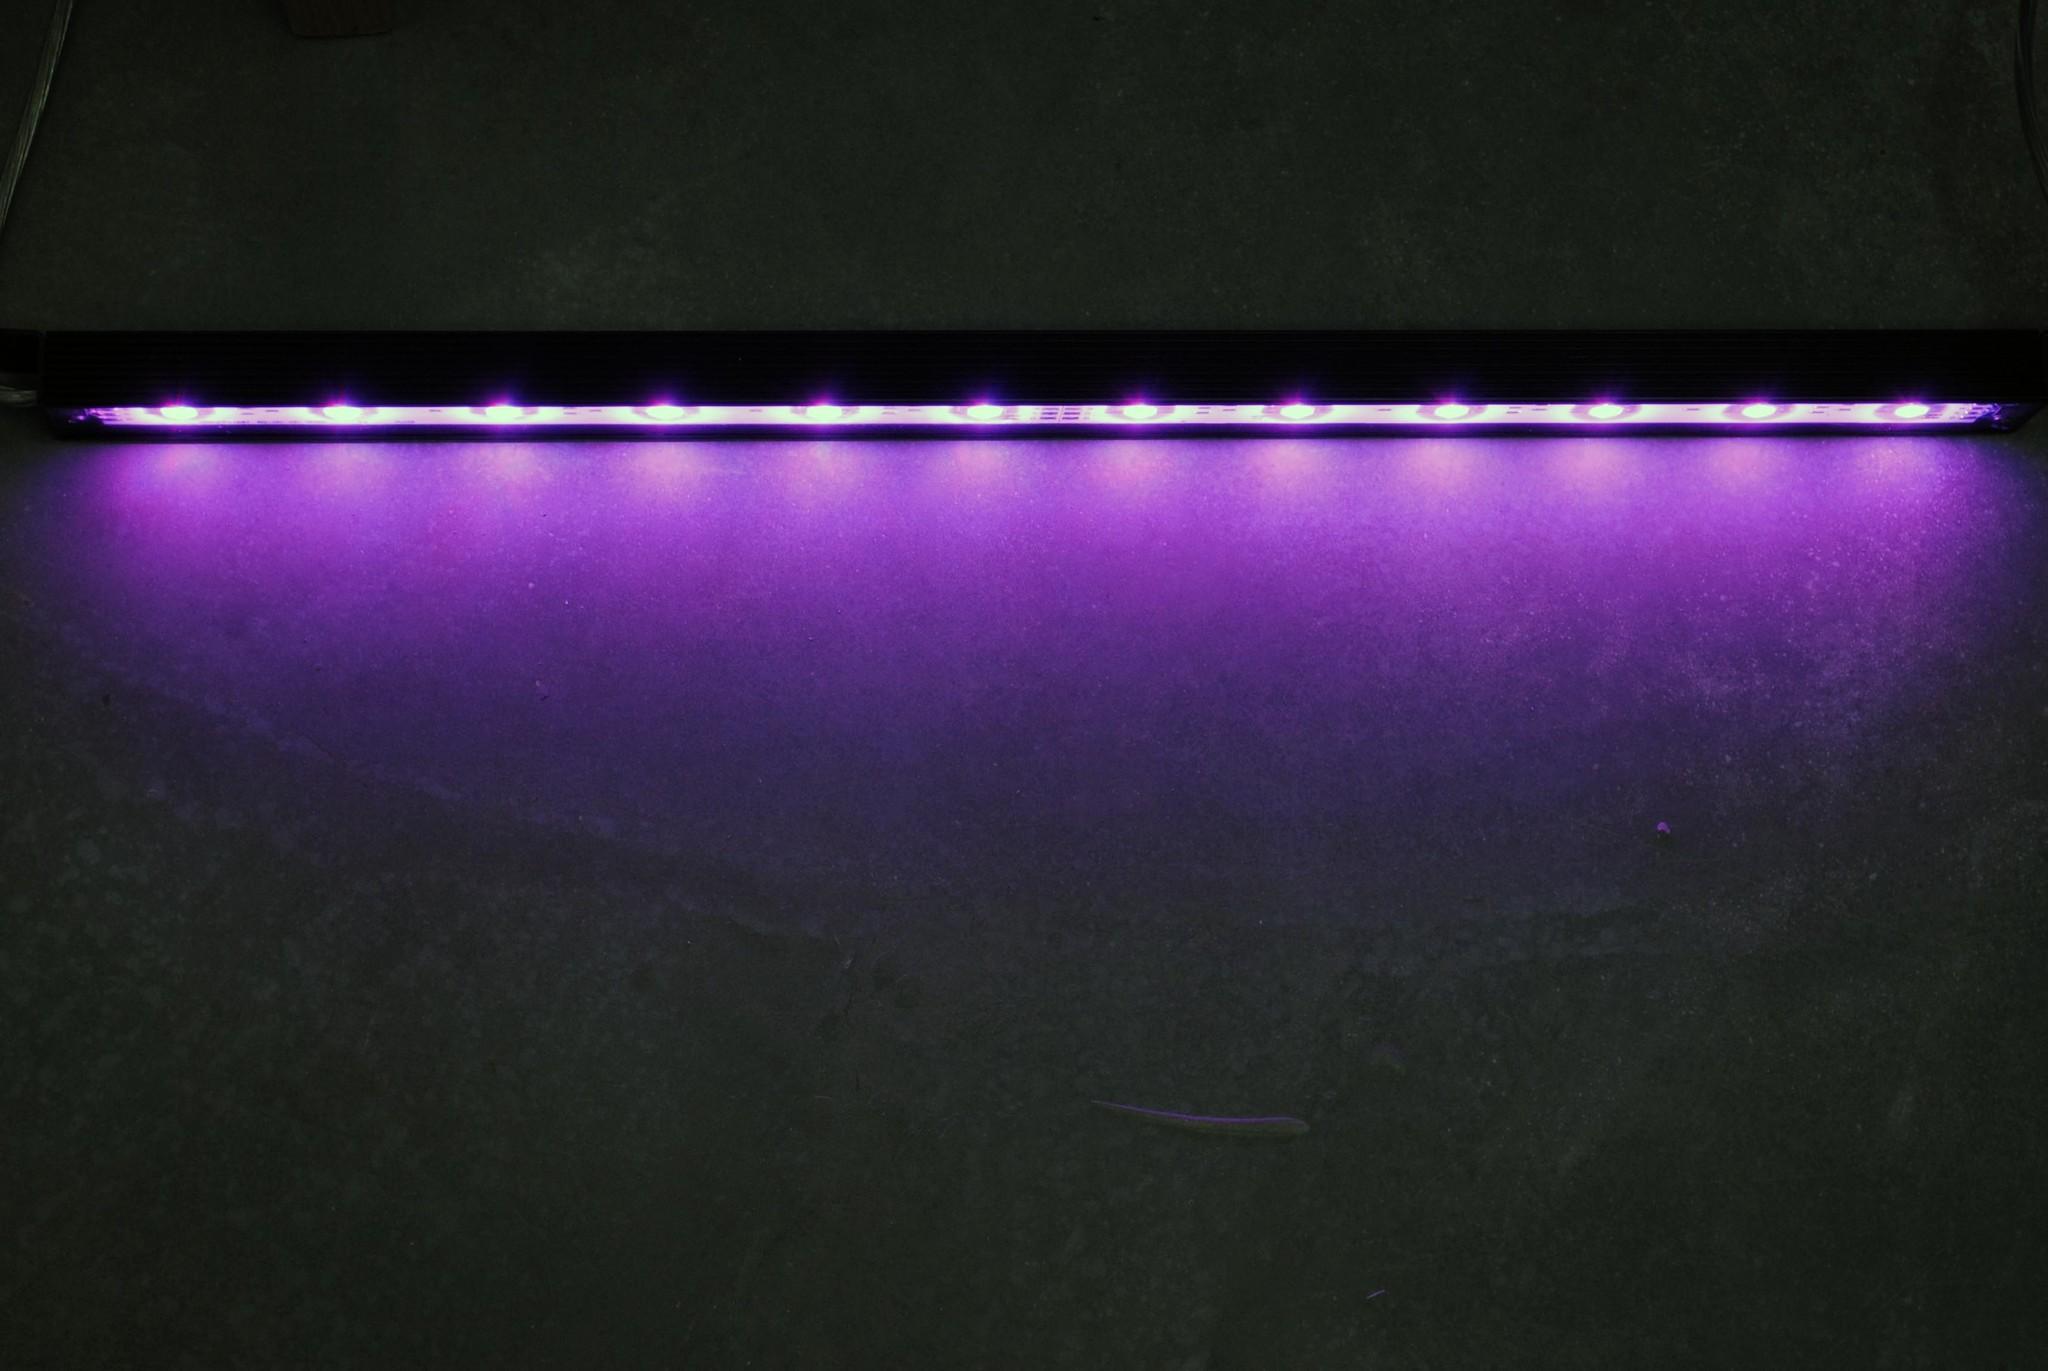 Striscia LED Rigida 50cm LEDBAR PRO - RGBWW IP68 impermeabile 12W 24V